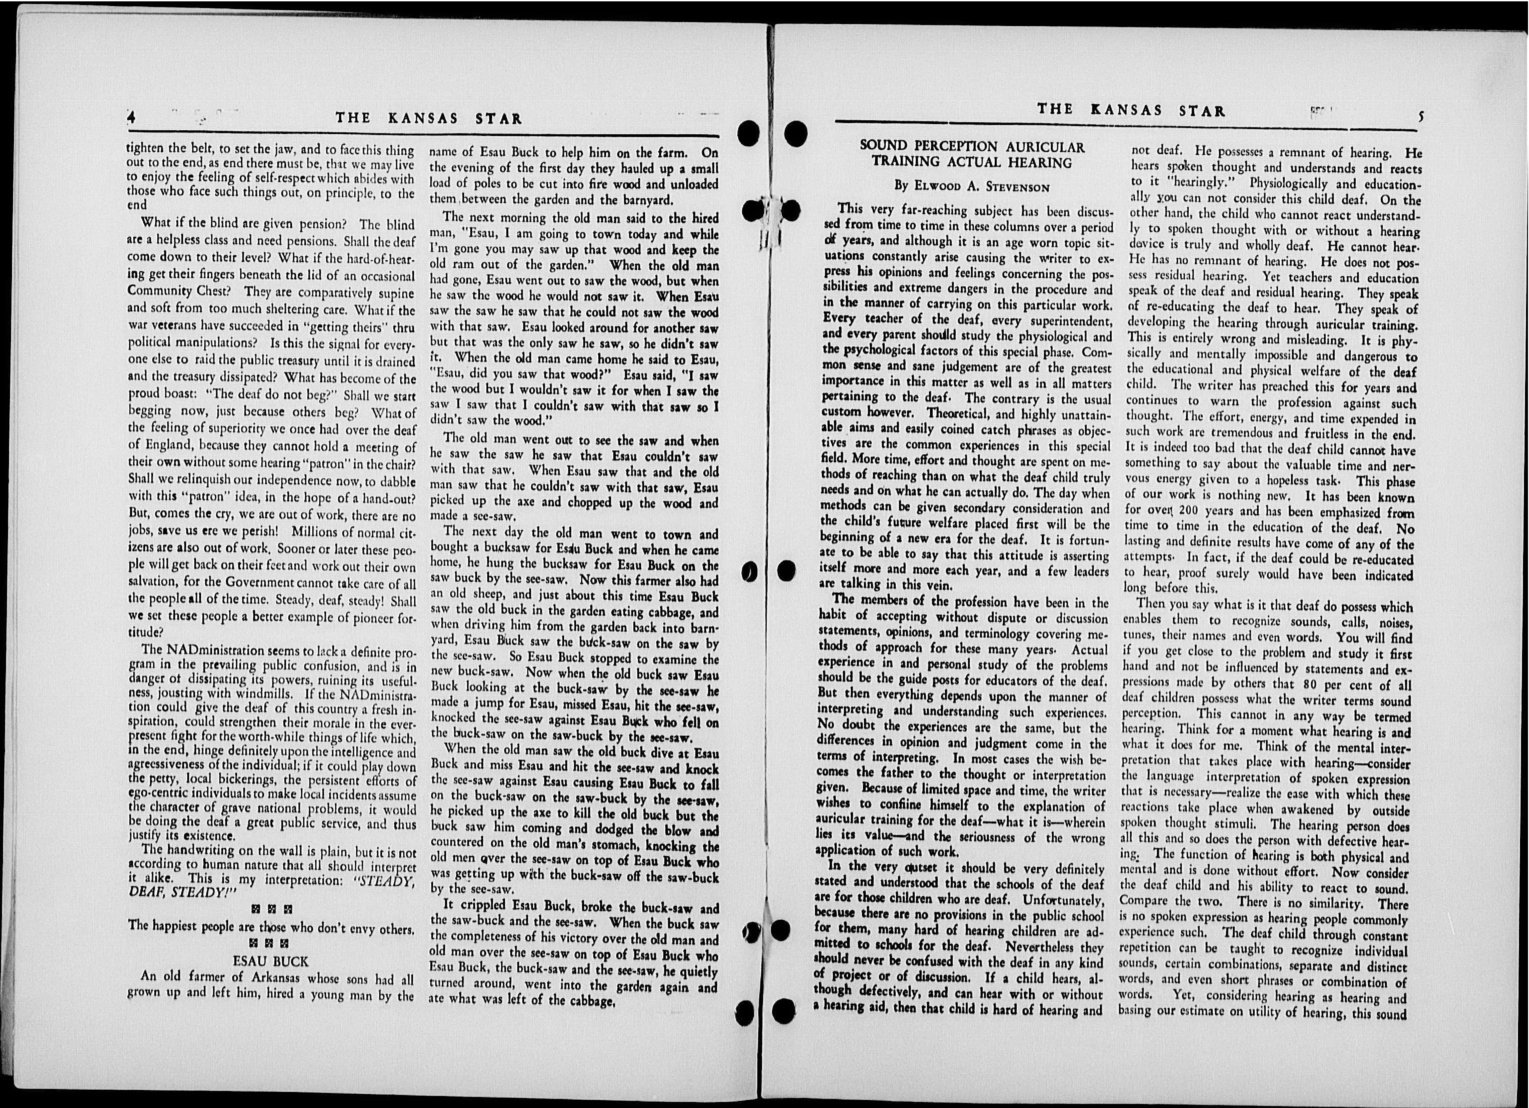 The Kansas Star, volume 50, number 8 - 4-5